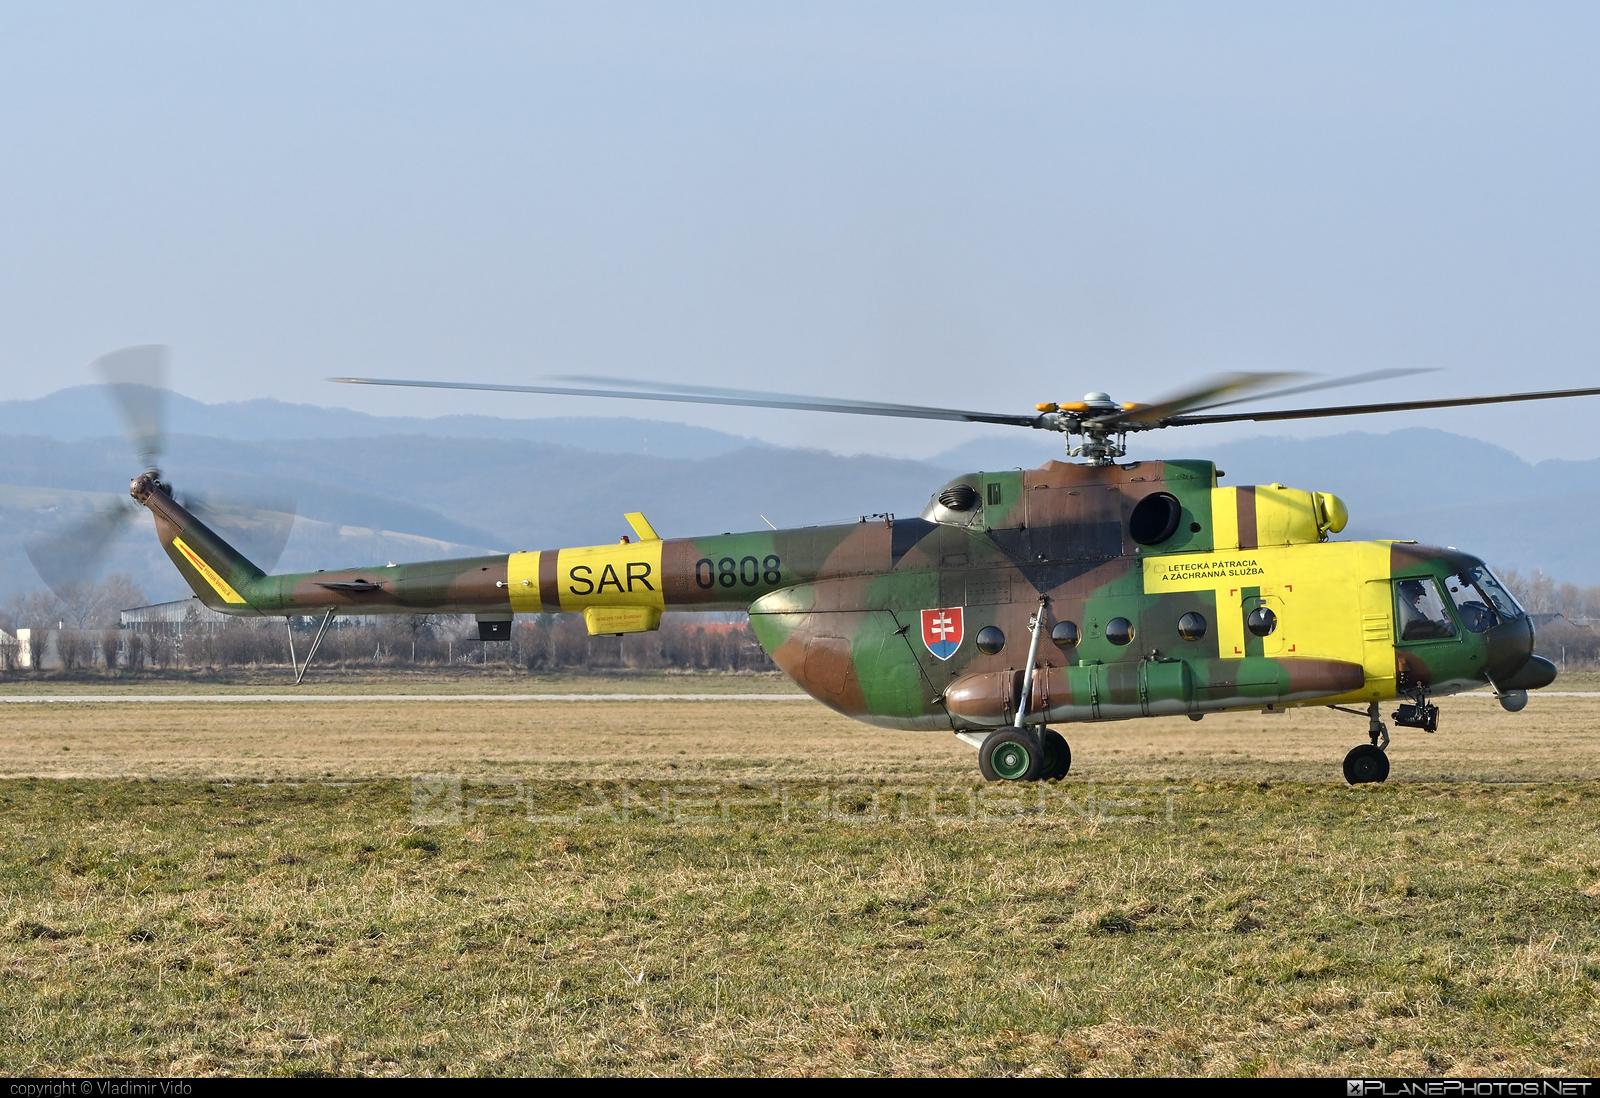 Mil Mi-17LPZS - 0808 operated by Vzdušné sily OS SR (Slovak Air Force) #mi17 #mi17lpzs #mil #milhelicopters #milmi17 #milmi17lpzs #slovakairforce #vzdusnesilyossr